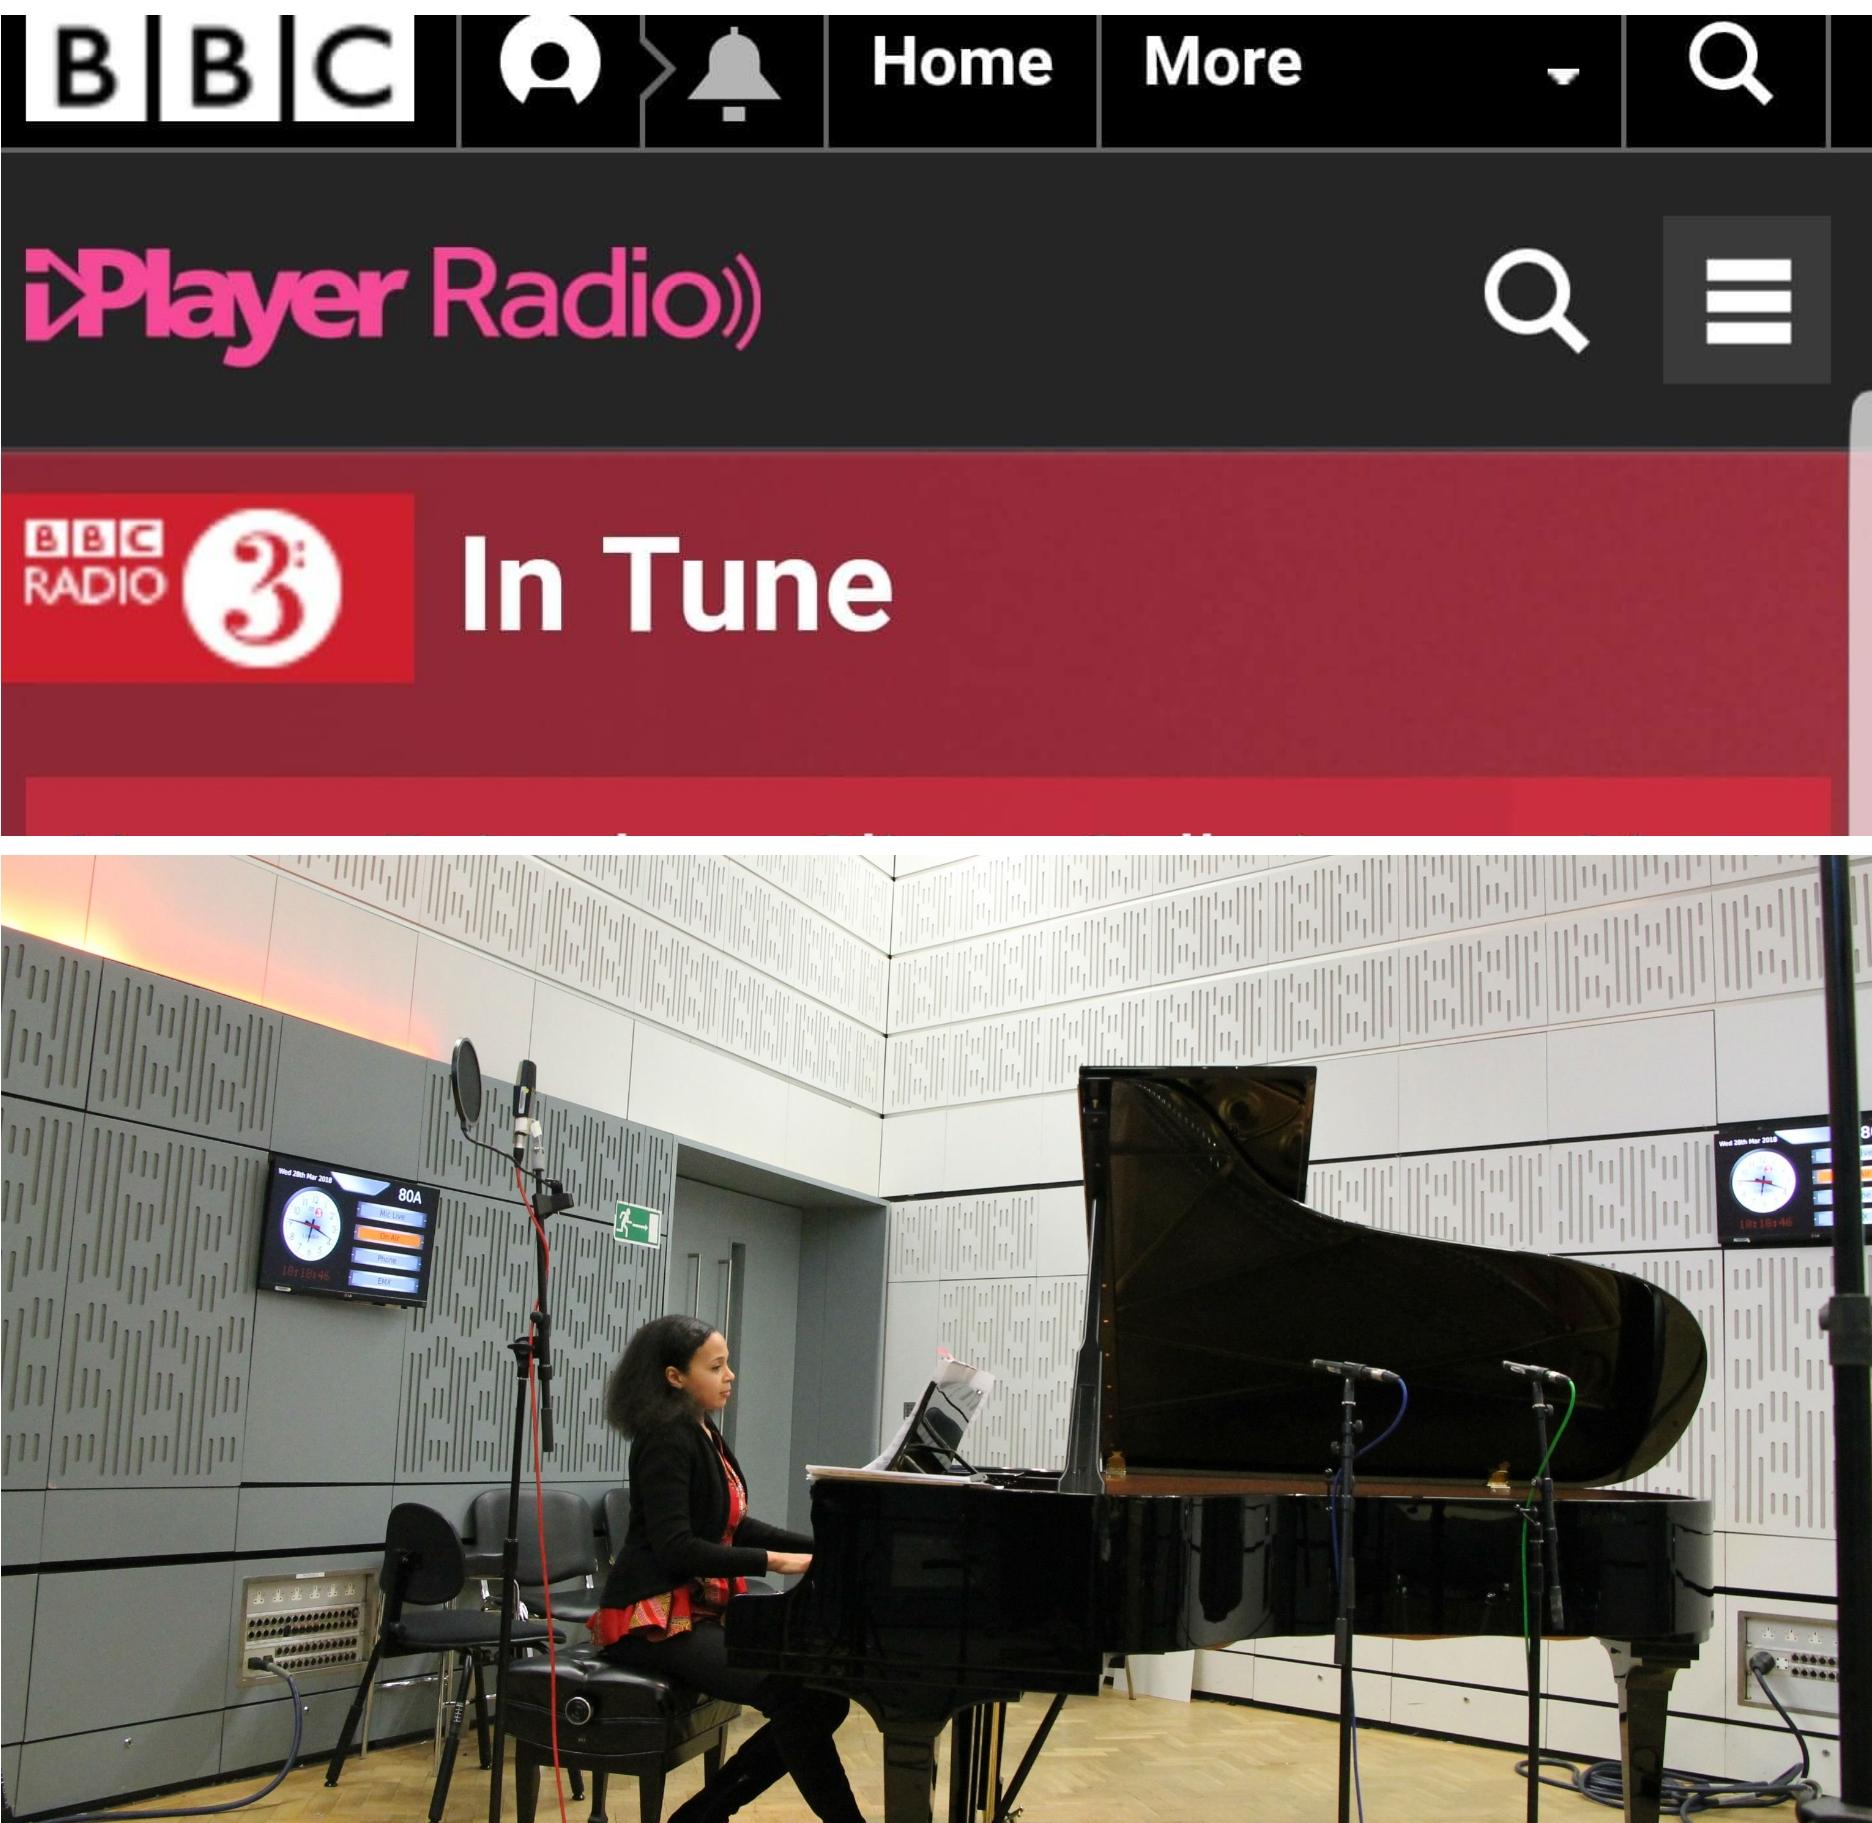 BBC Radio 3 - Rebeca performs and discusses Nigerian classical music live on BBC Radio 3